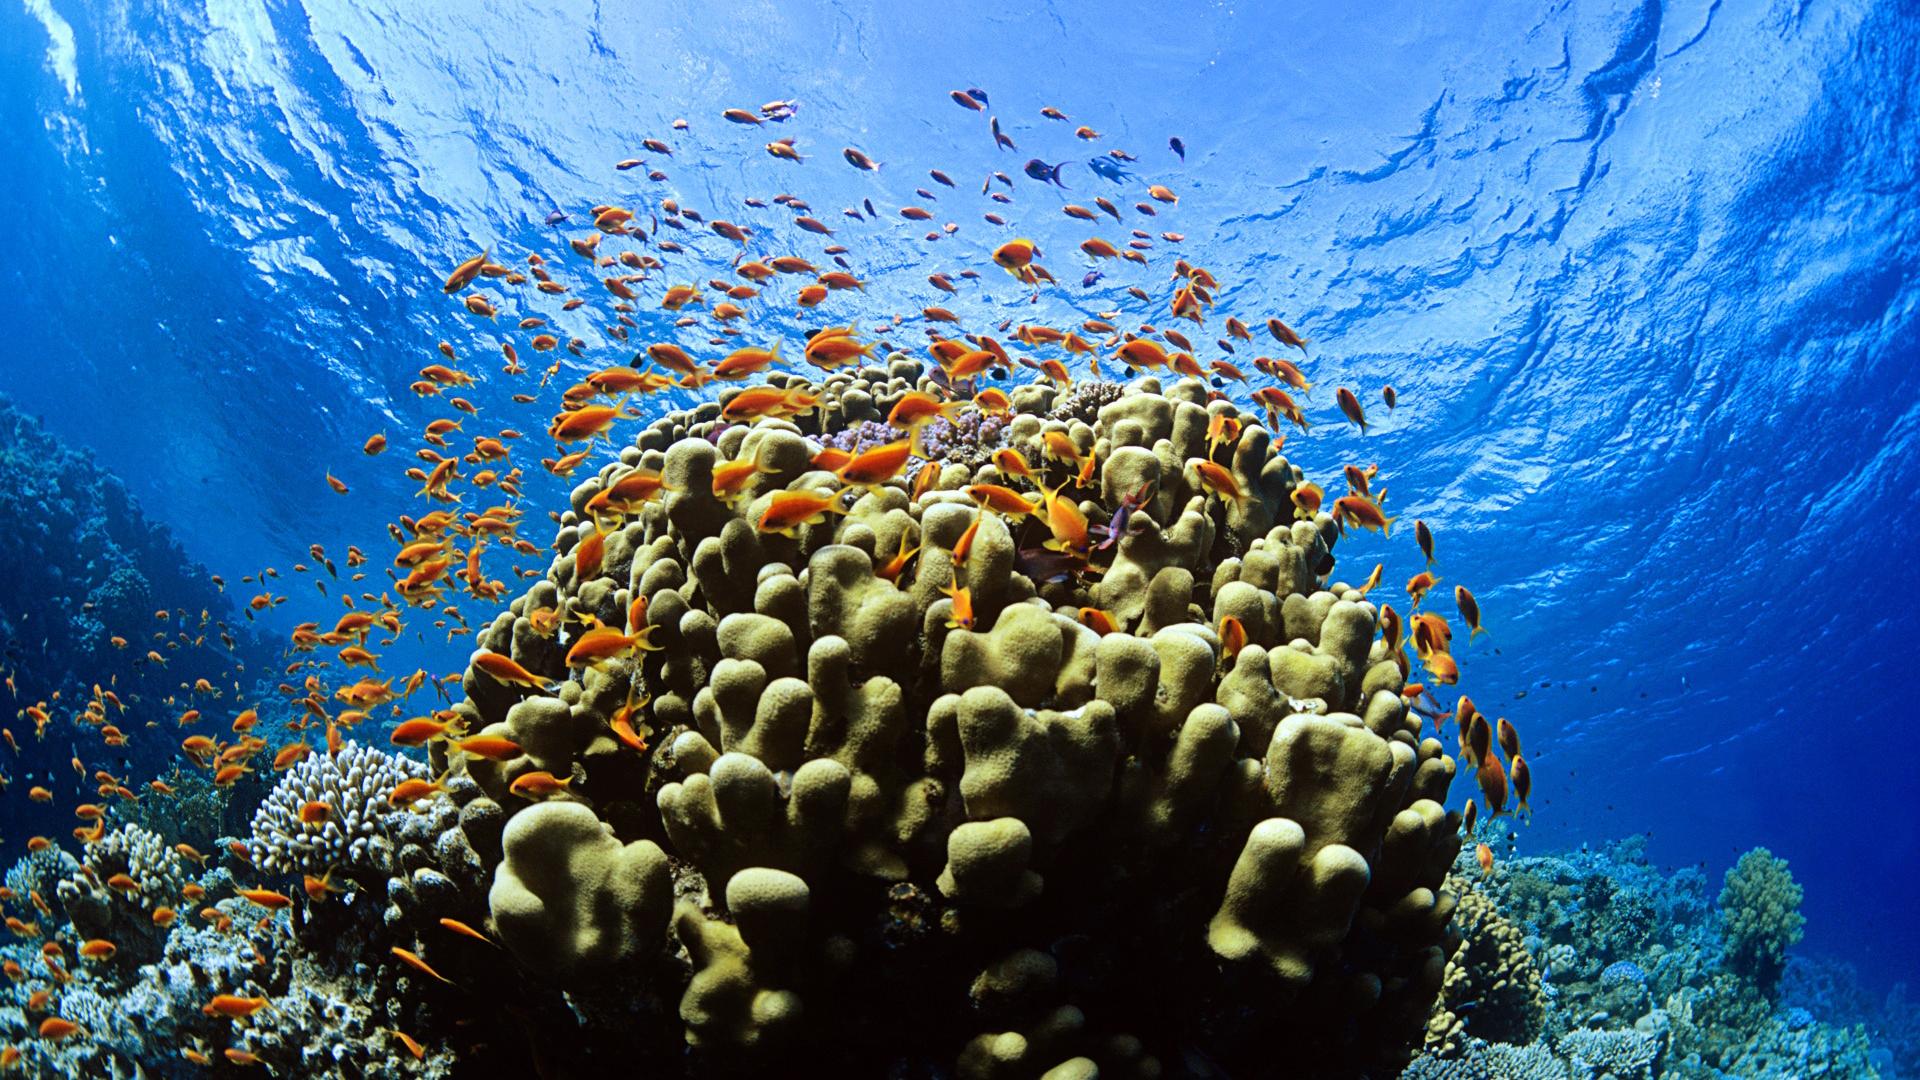 Hd wallpaper underwater - Homepage Underwater Underwater Hd Wallpaper 1920x1080 7